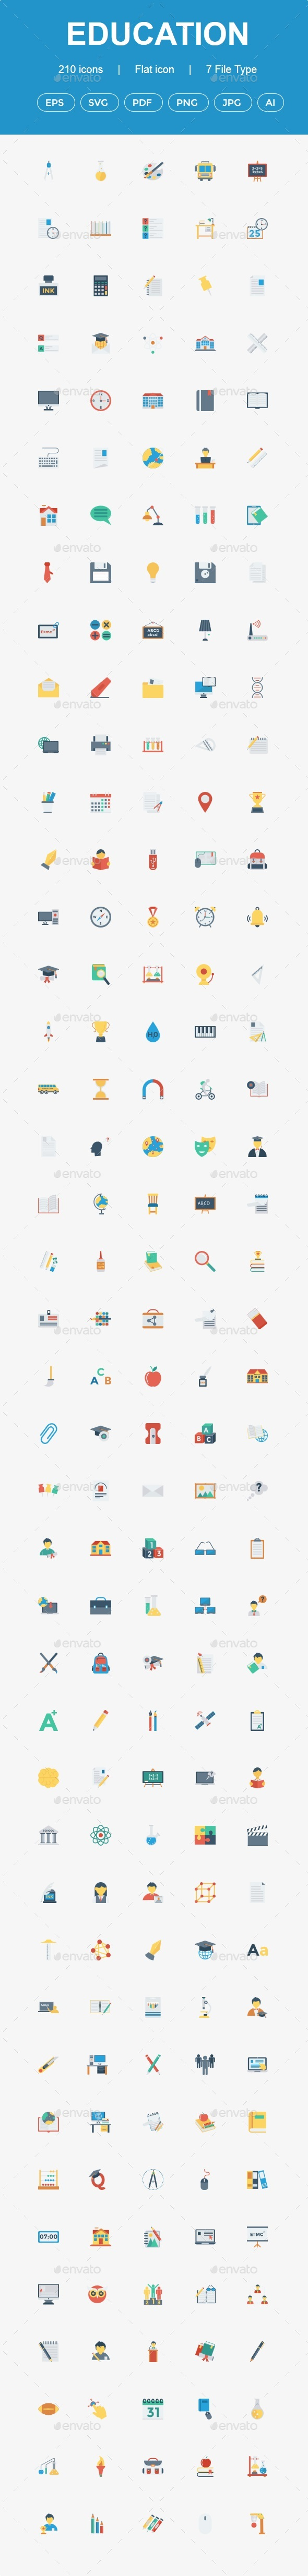 200 Education Flat icons - Technology Icons